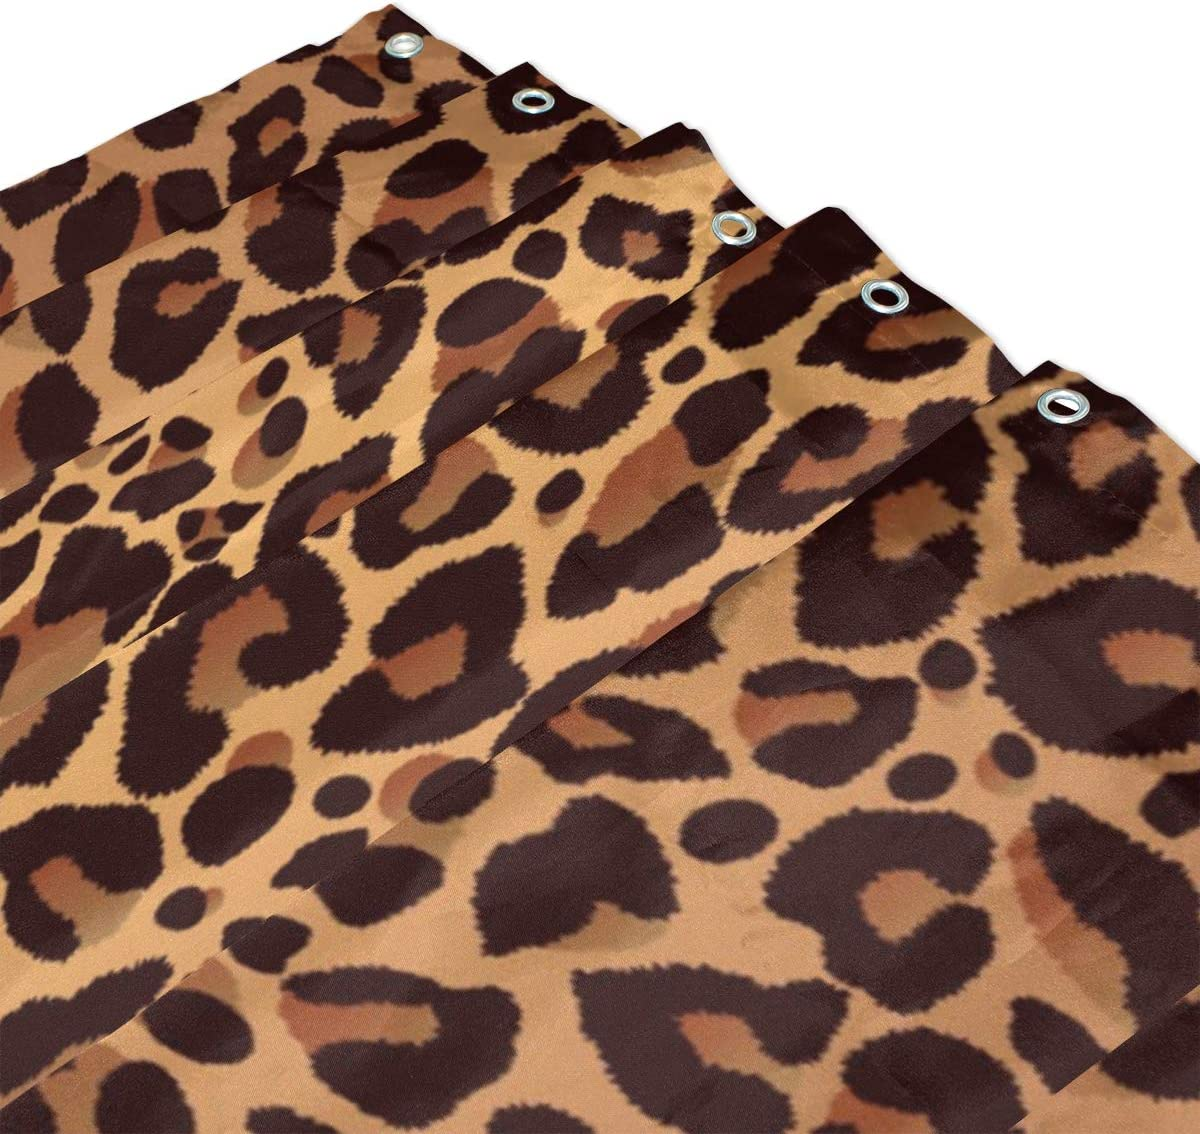 Tenda da Doccia in Stile Vintage Impermeabile Stampa Leopardata con 12 Ganci WowPrint 182 x 182 cm